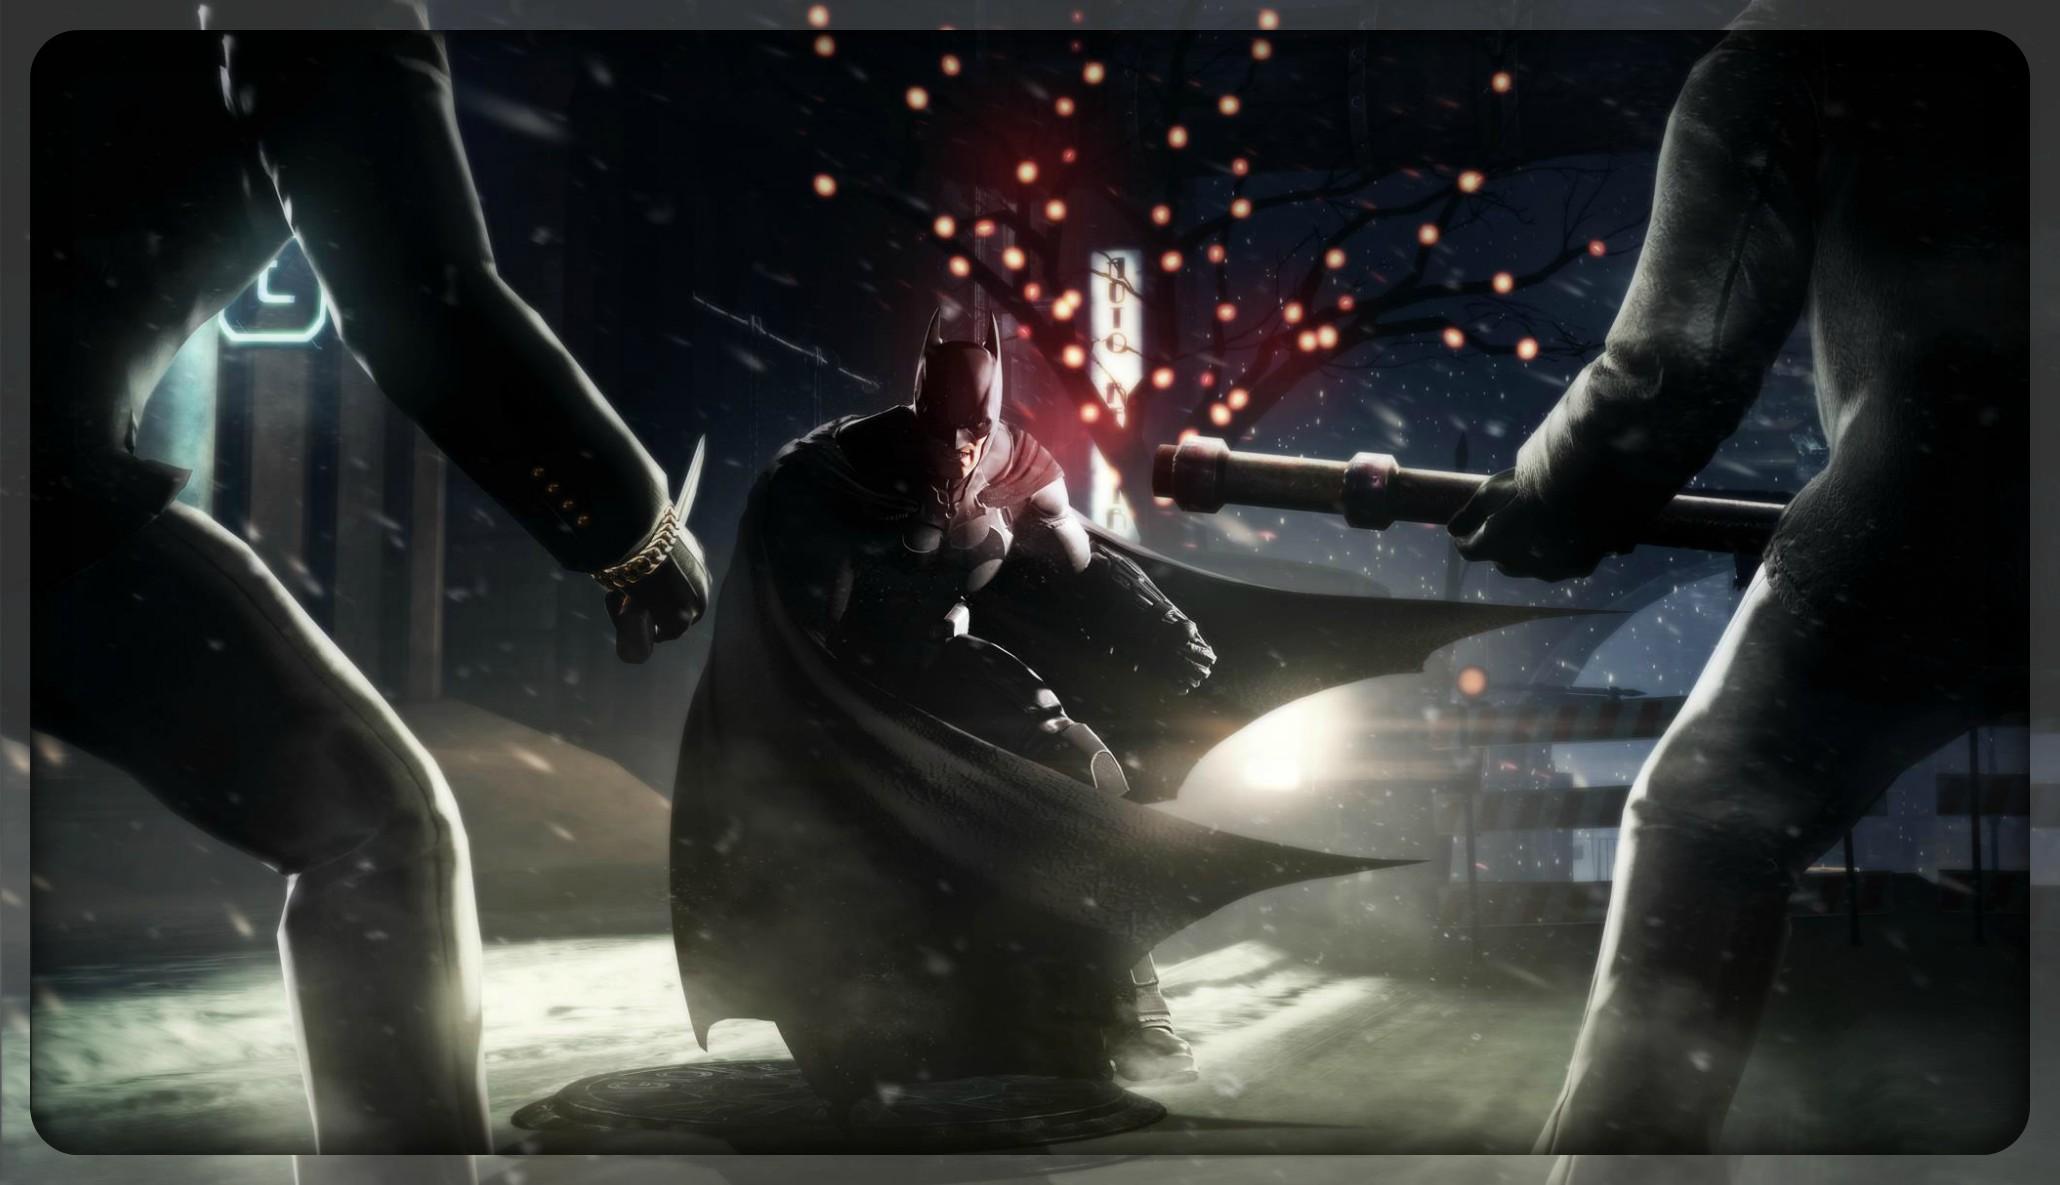 Batman asus-zenfone-3-review-gaming-batman-1